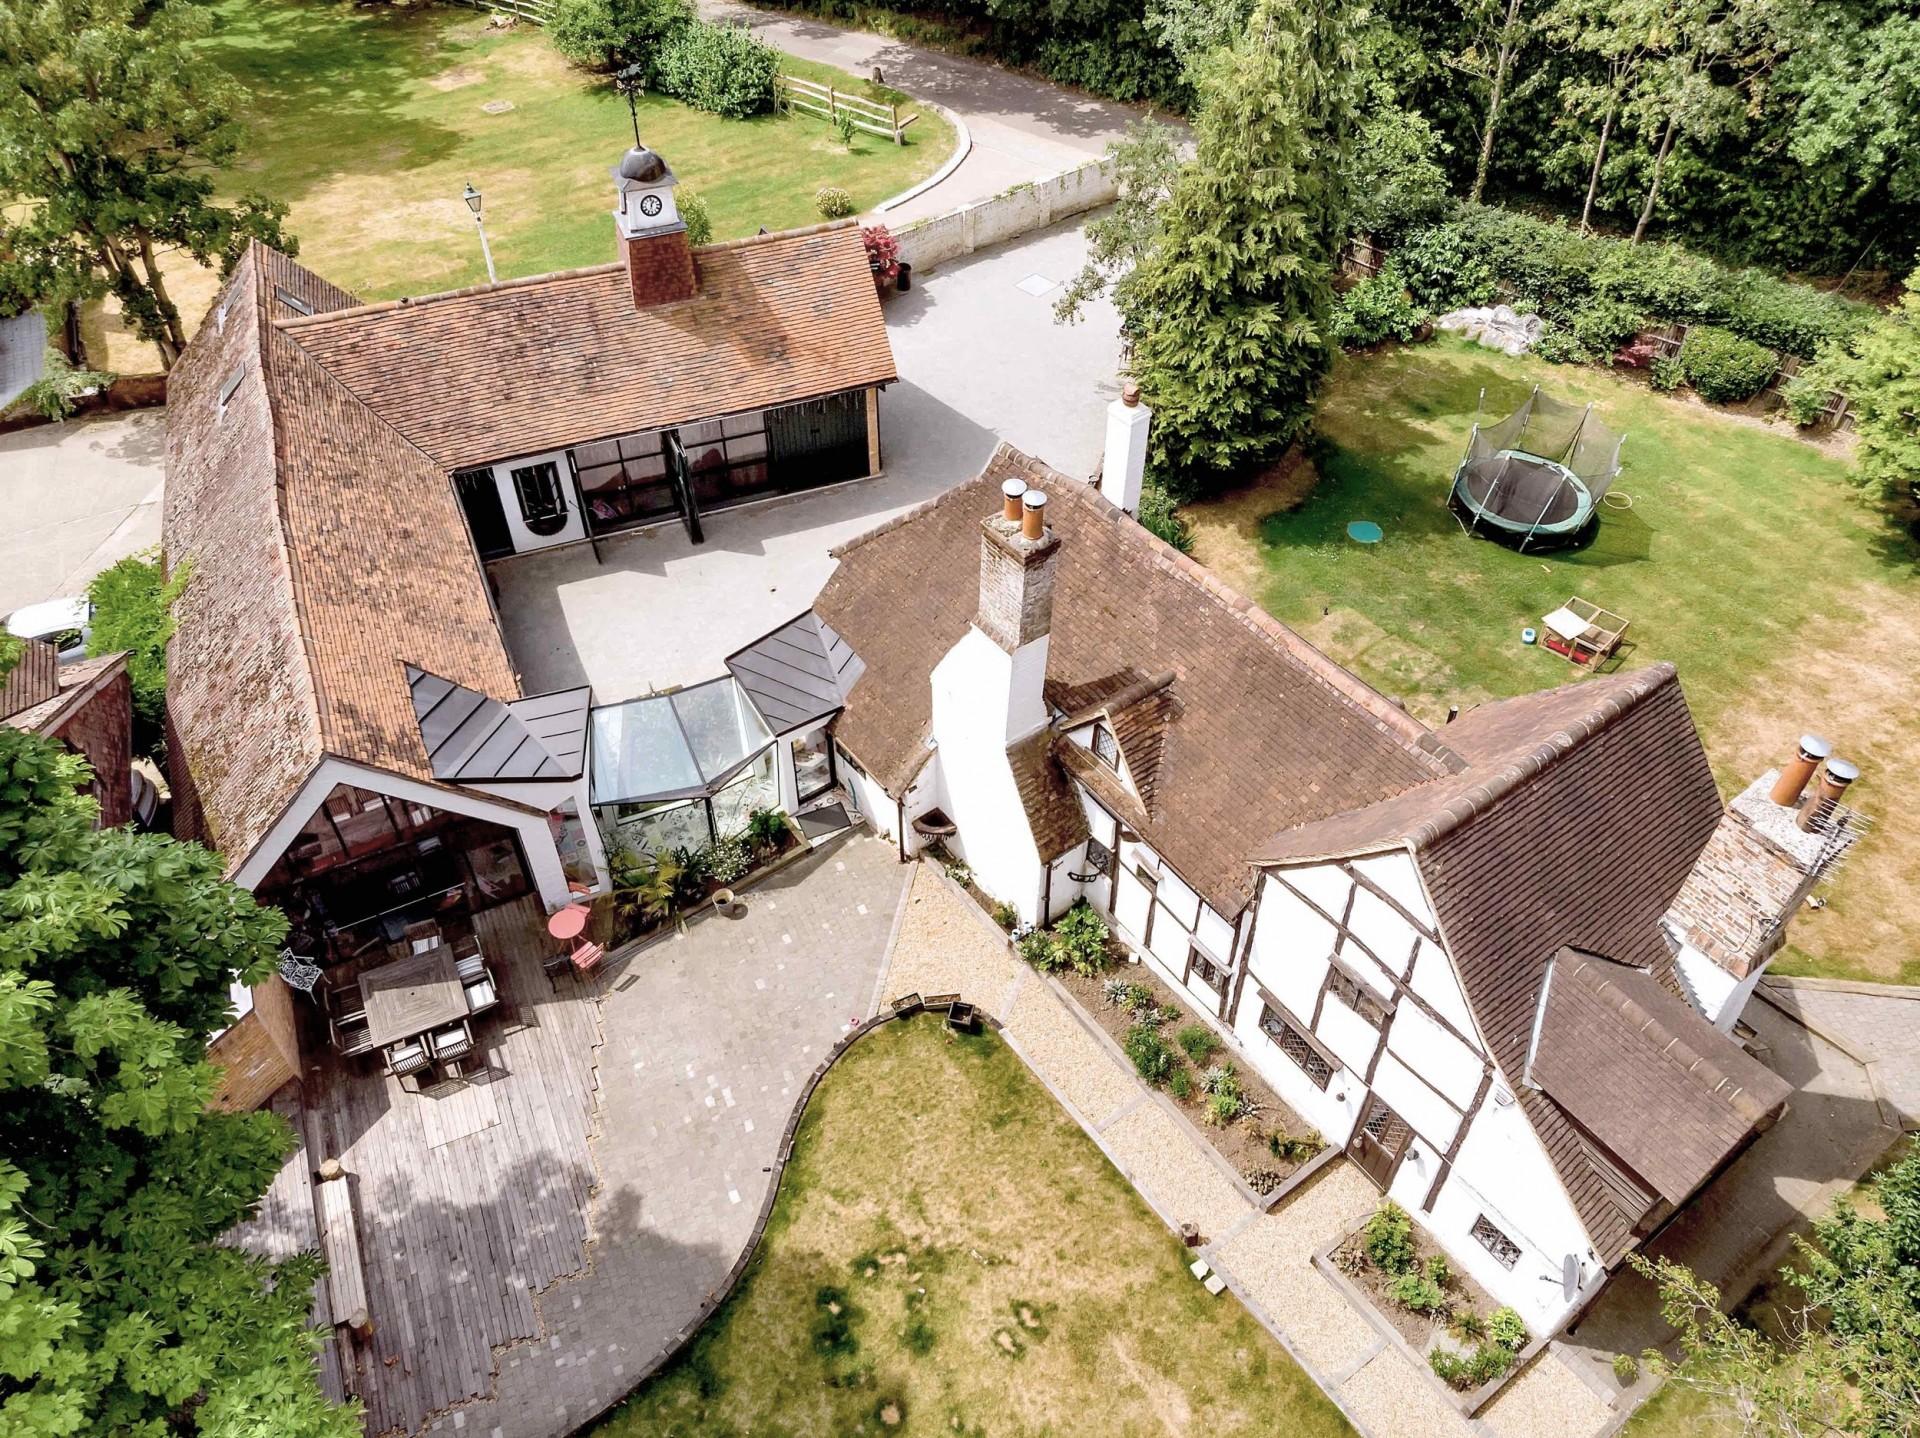 Stanyards Stables, Chobham, Surrey